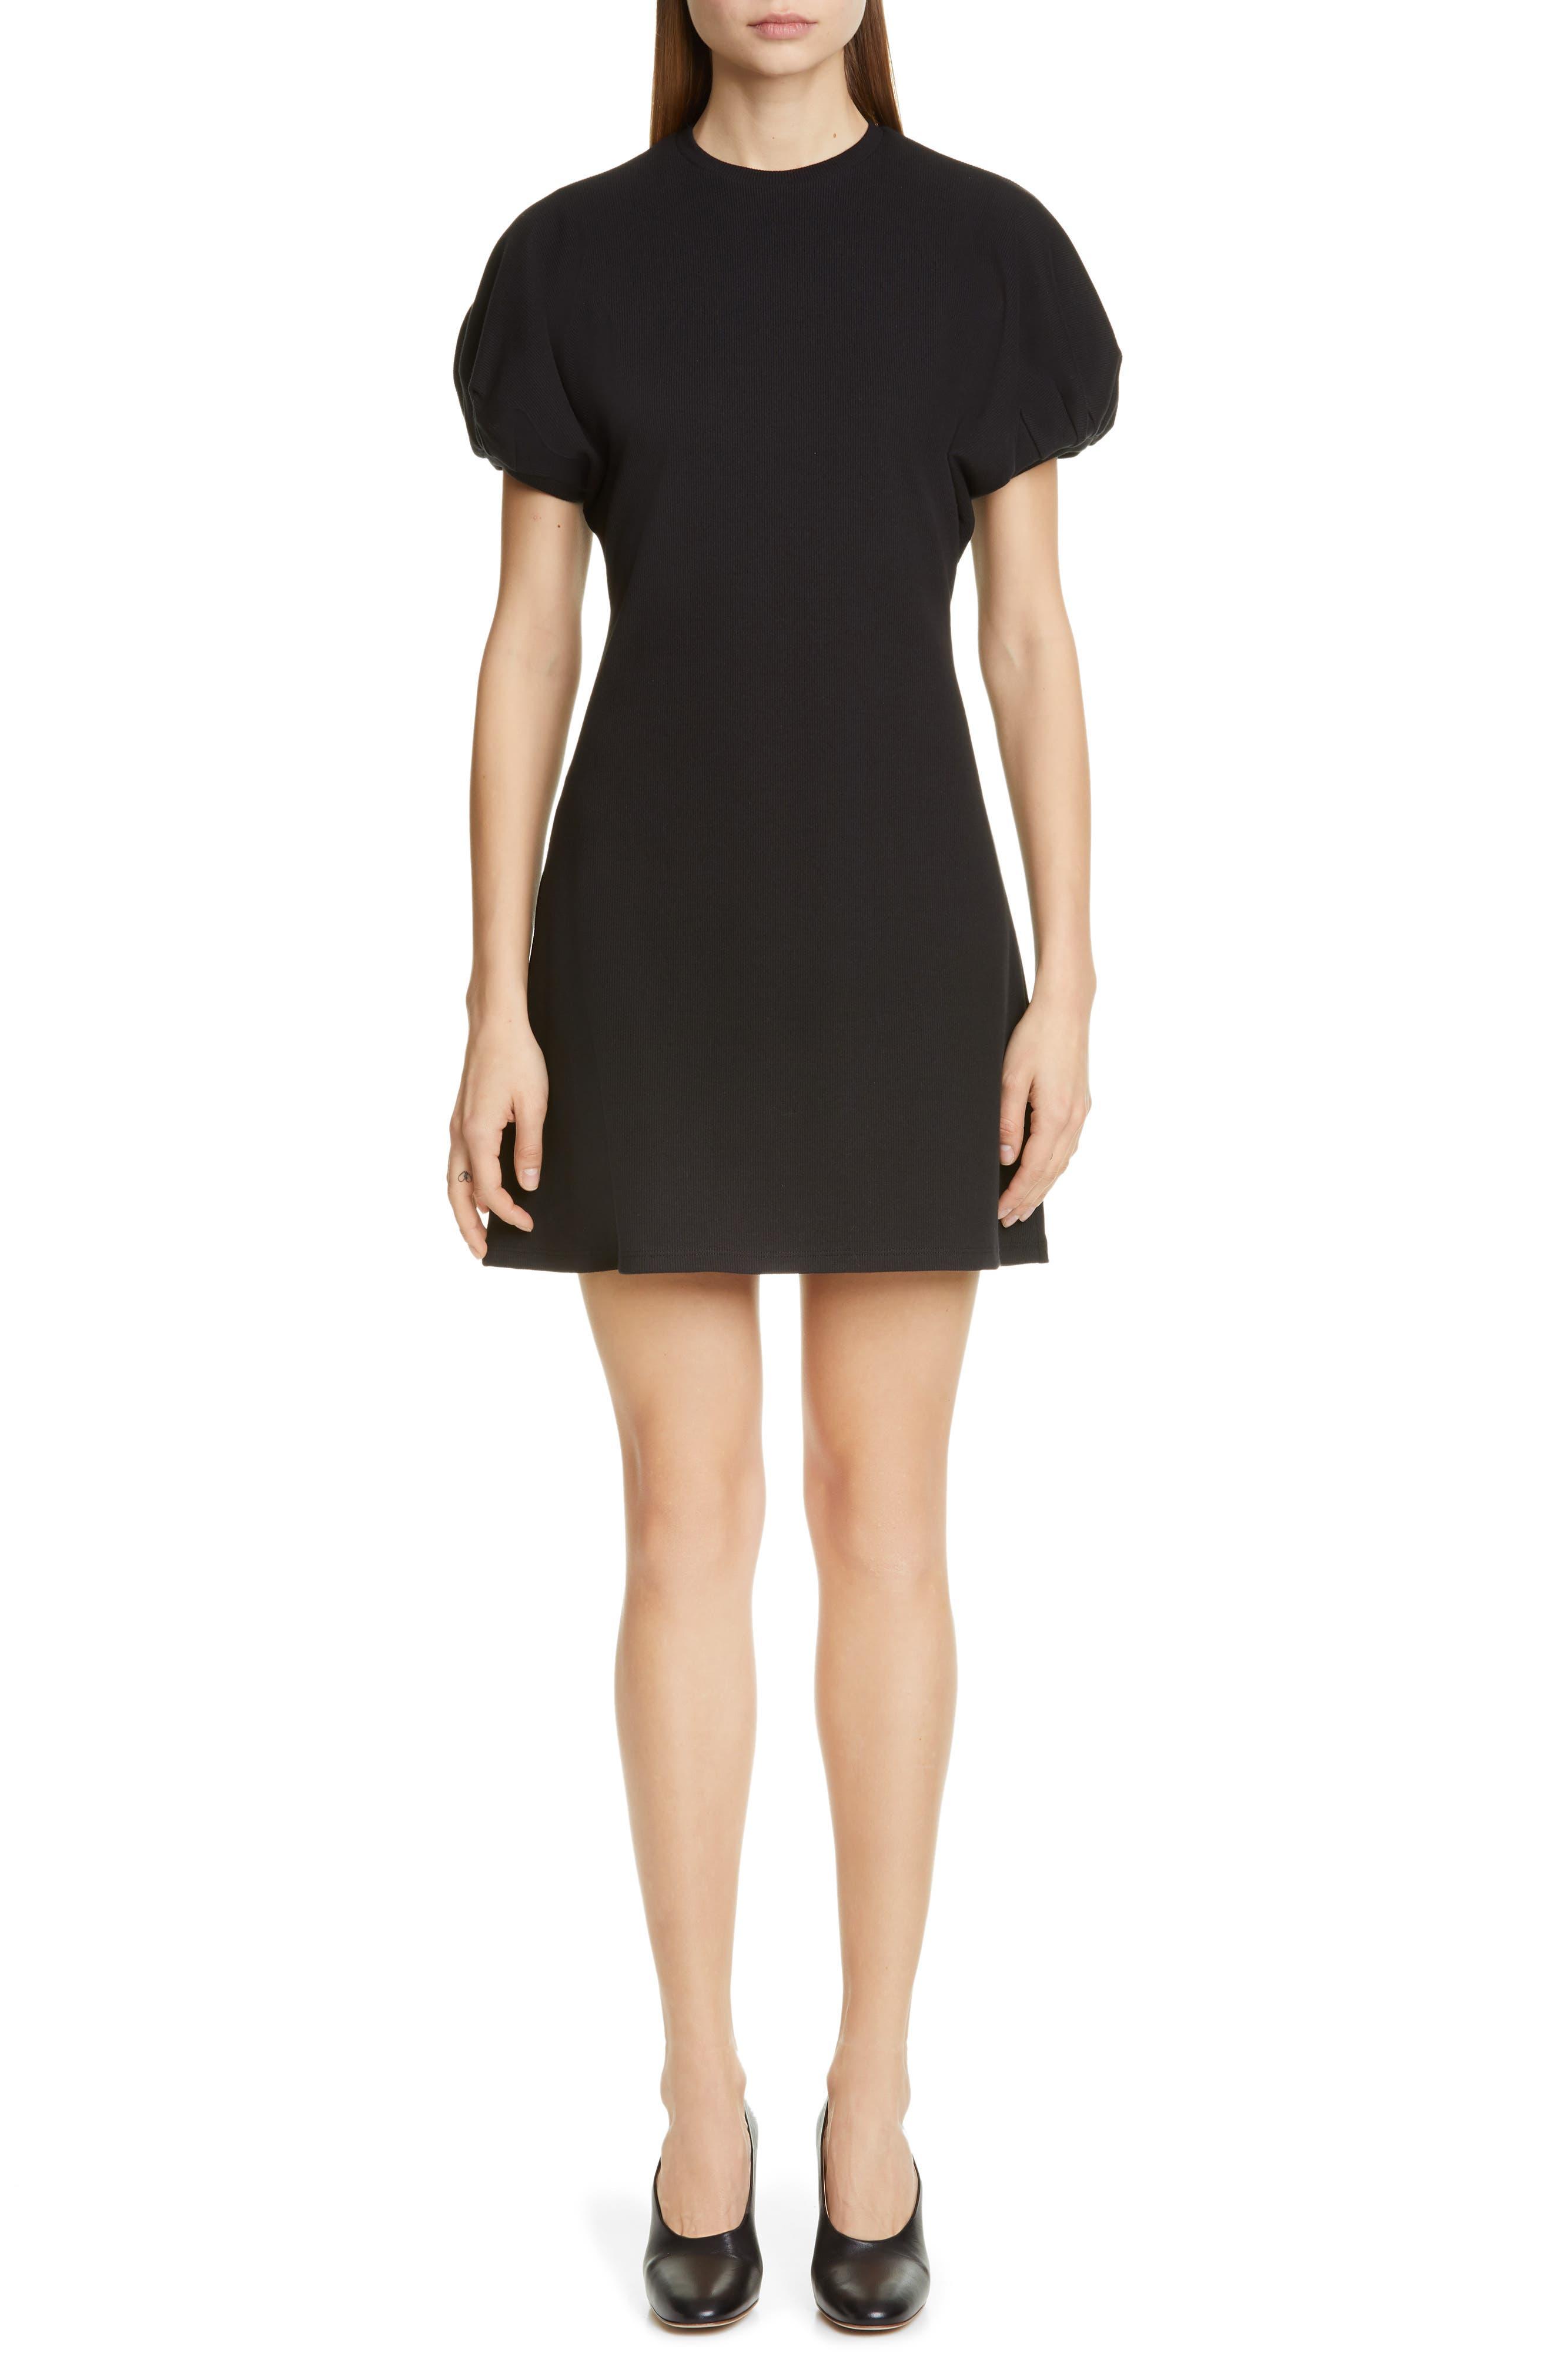 BEAUFILLE Leda Puff Sleeve Dress, Main, color, BLACK